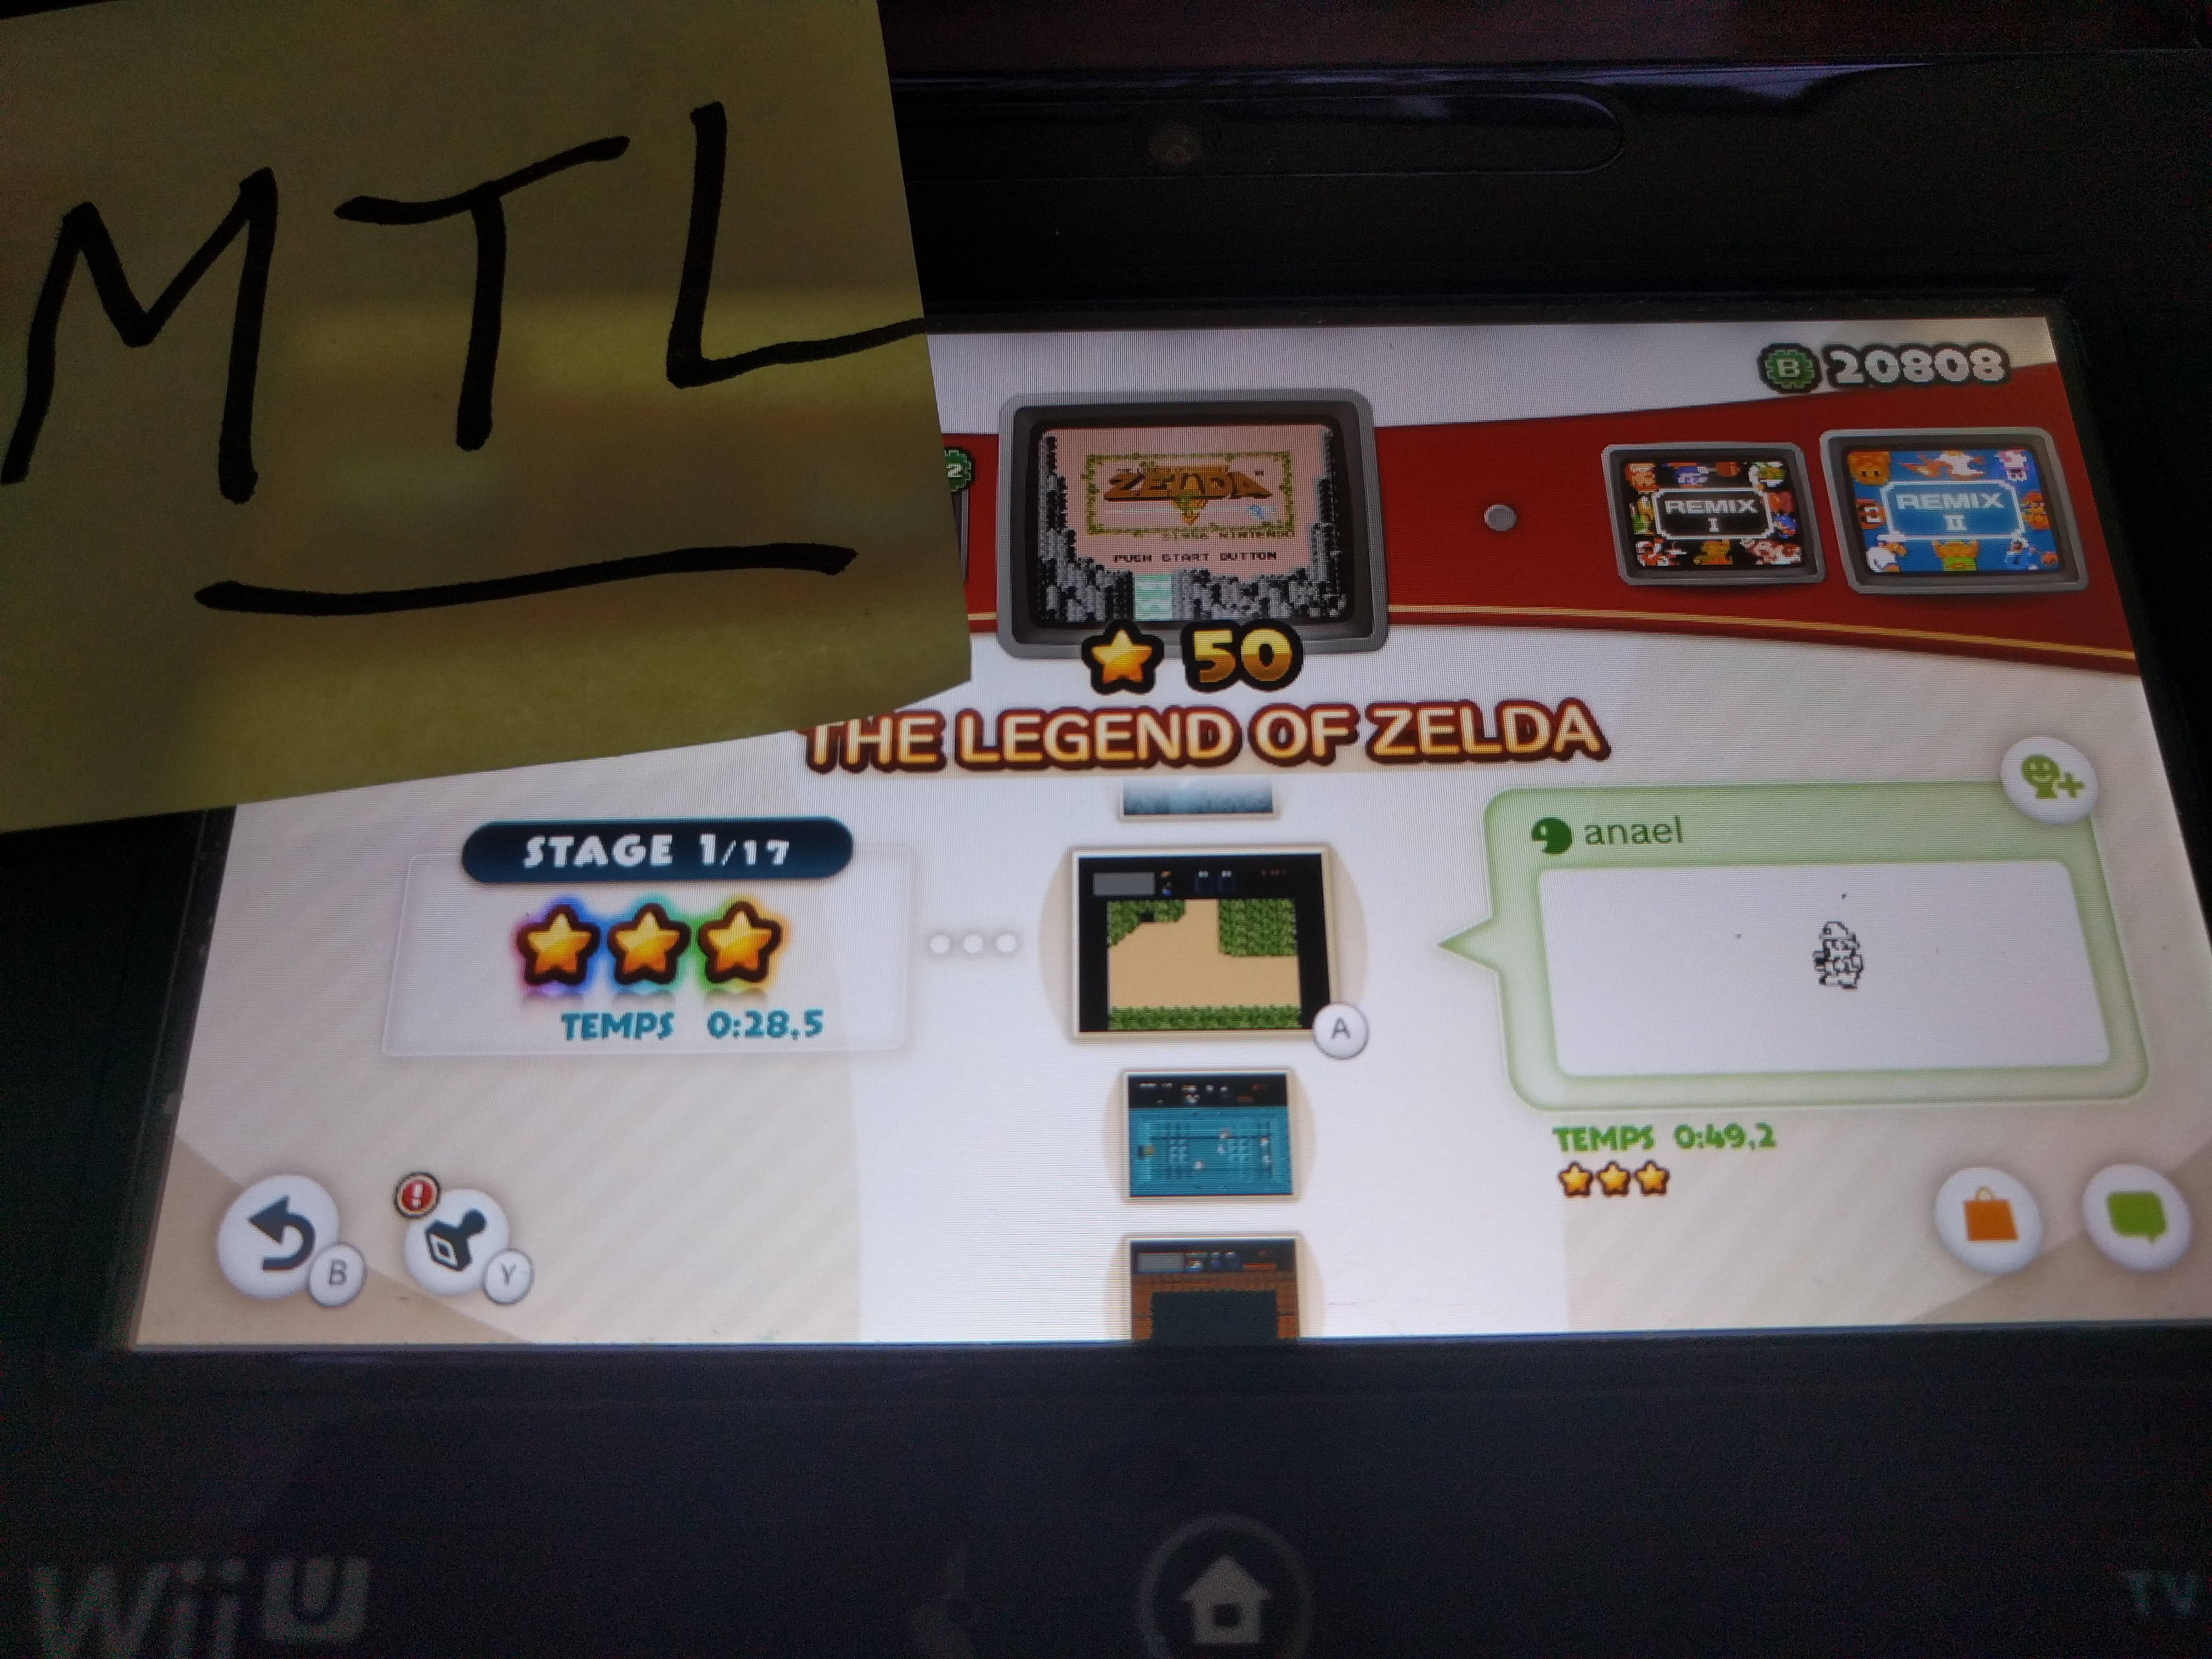 Mantalow: NES Remix: The Legend of Zelda: Stage 1 (Wii U) 0:00:28.5 points on 2016-06-10 05:42:37